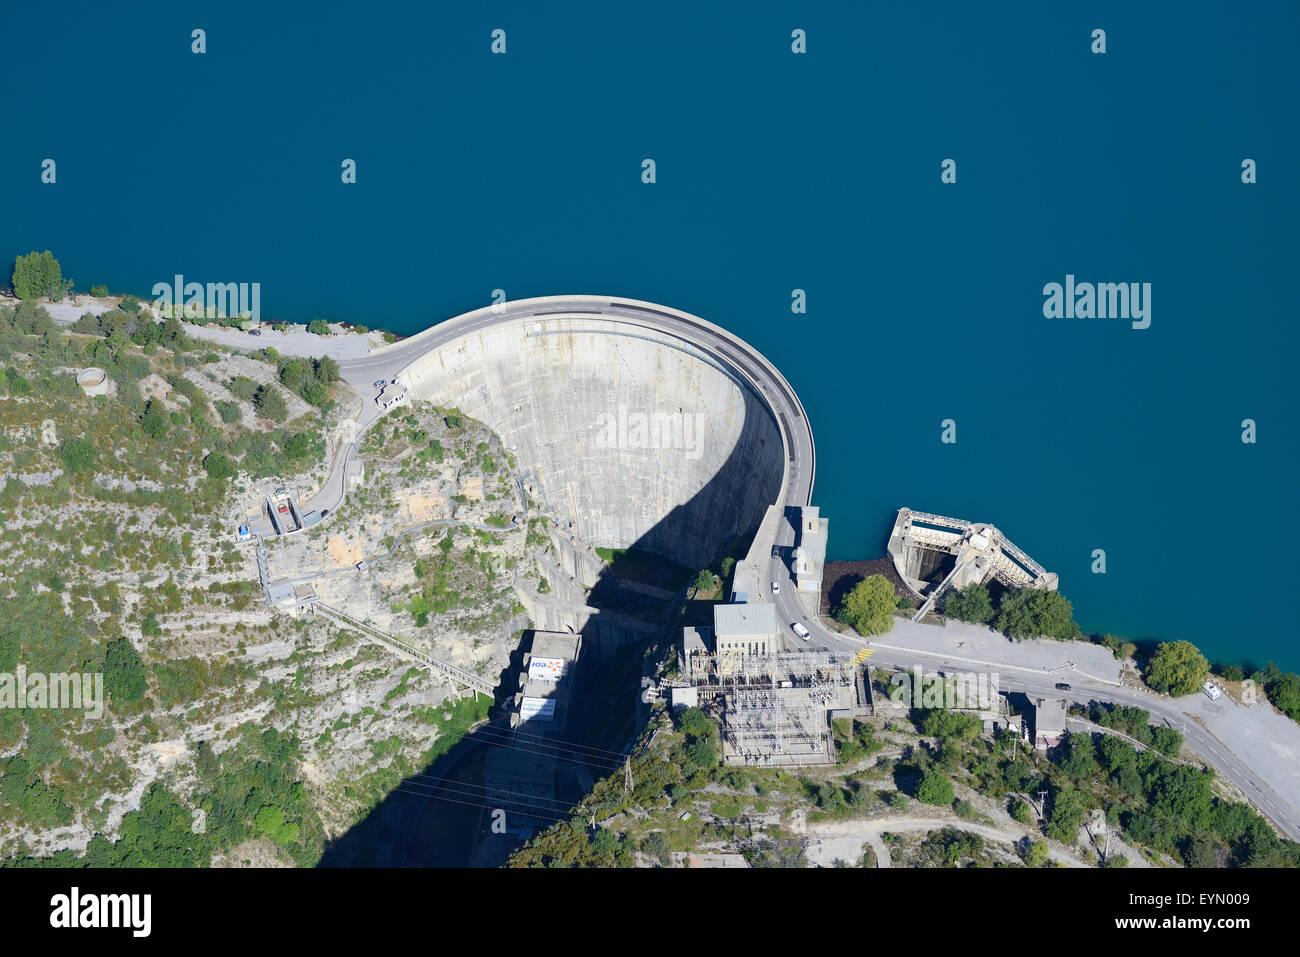 CASTILLON DAM (aerial view). Reservoir on the Verdon River. Near Castellane, in Alpes-de-Haute-Provence, France. Stock Photo